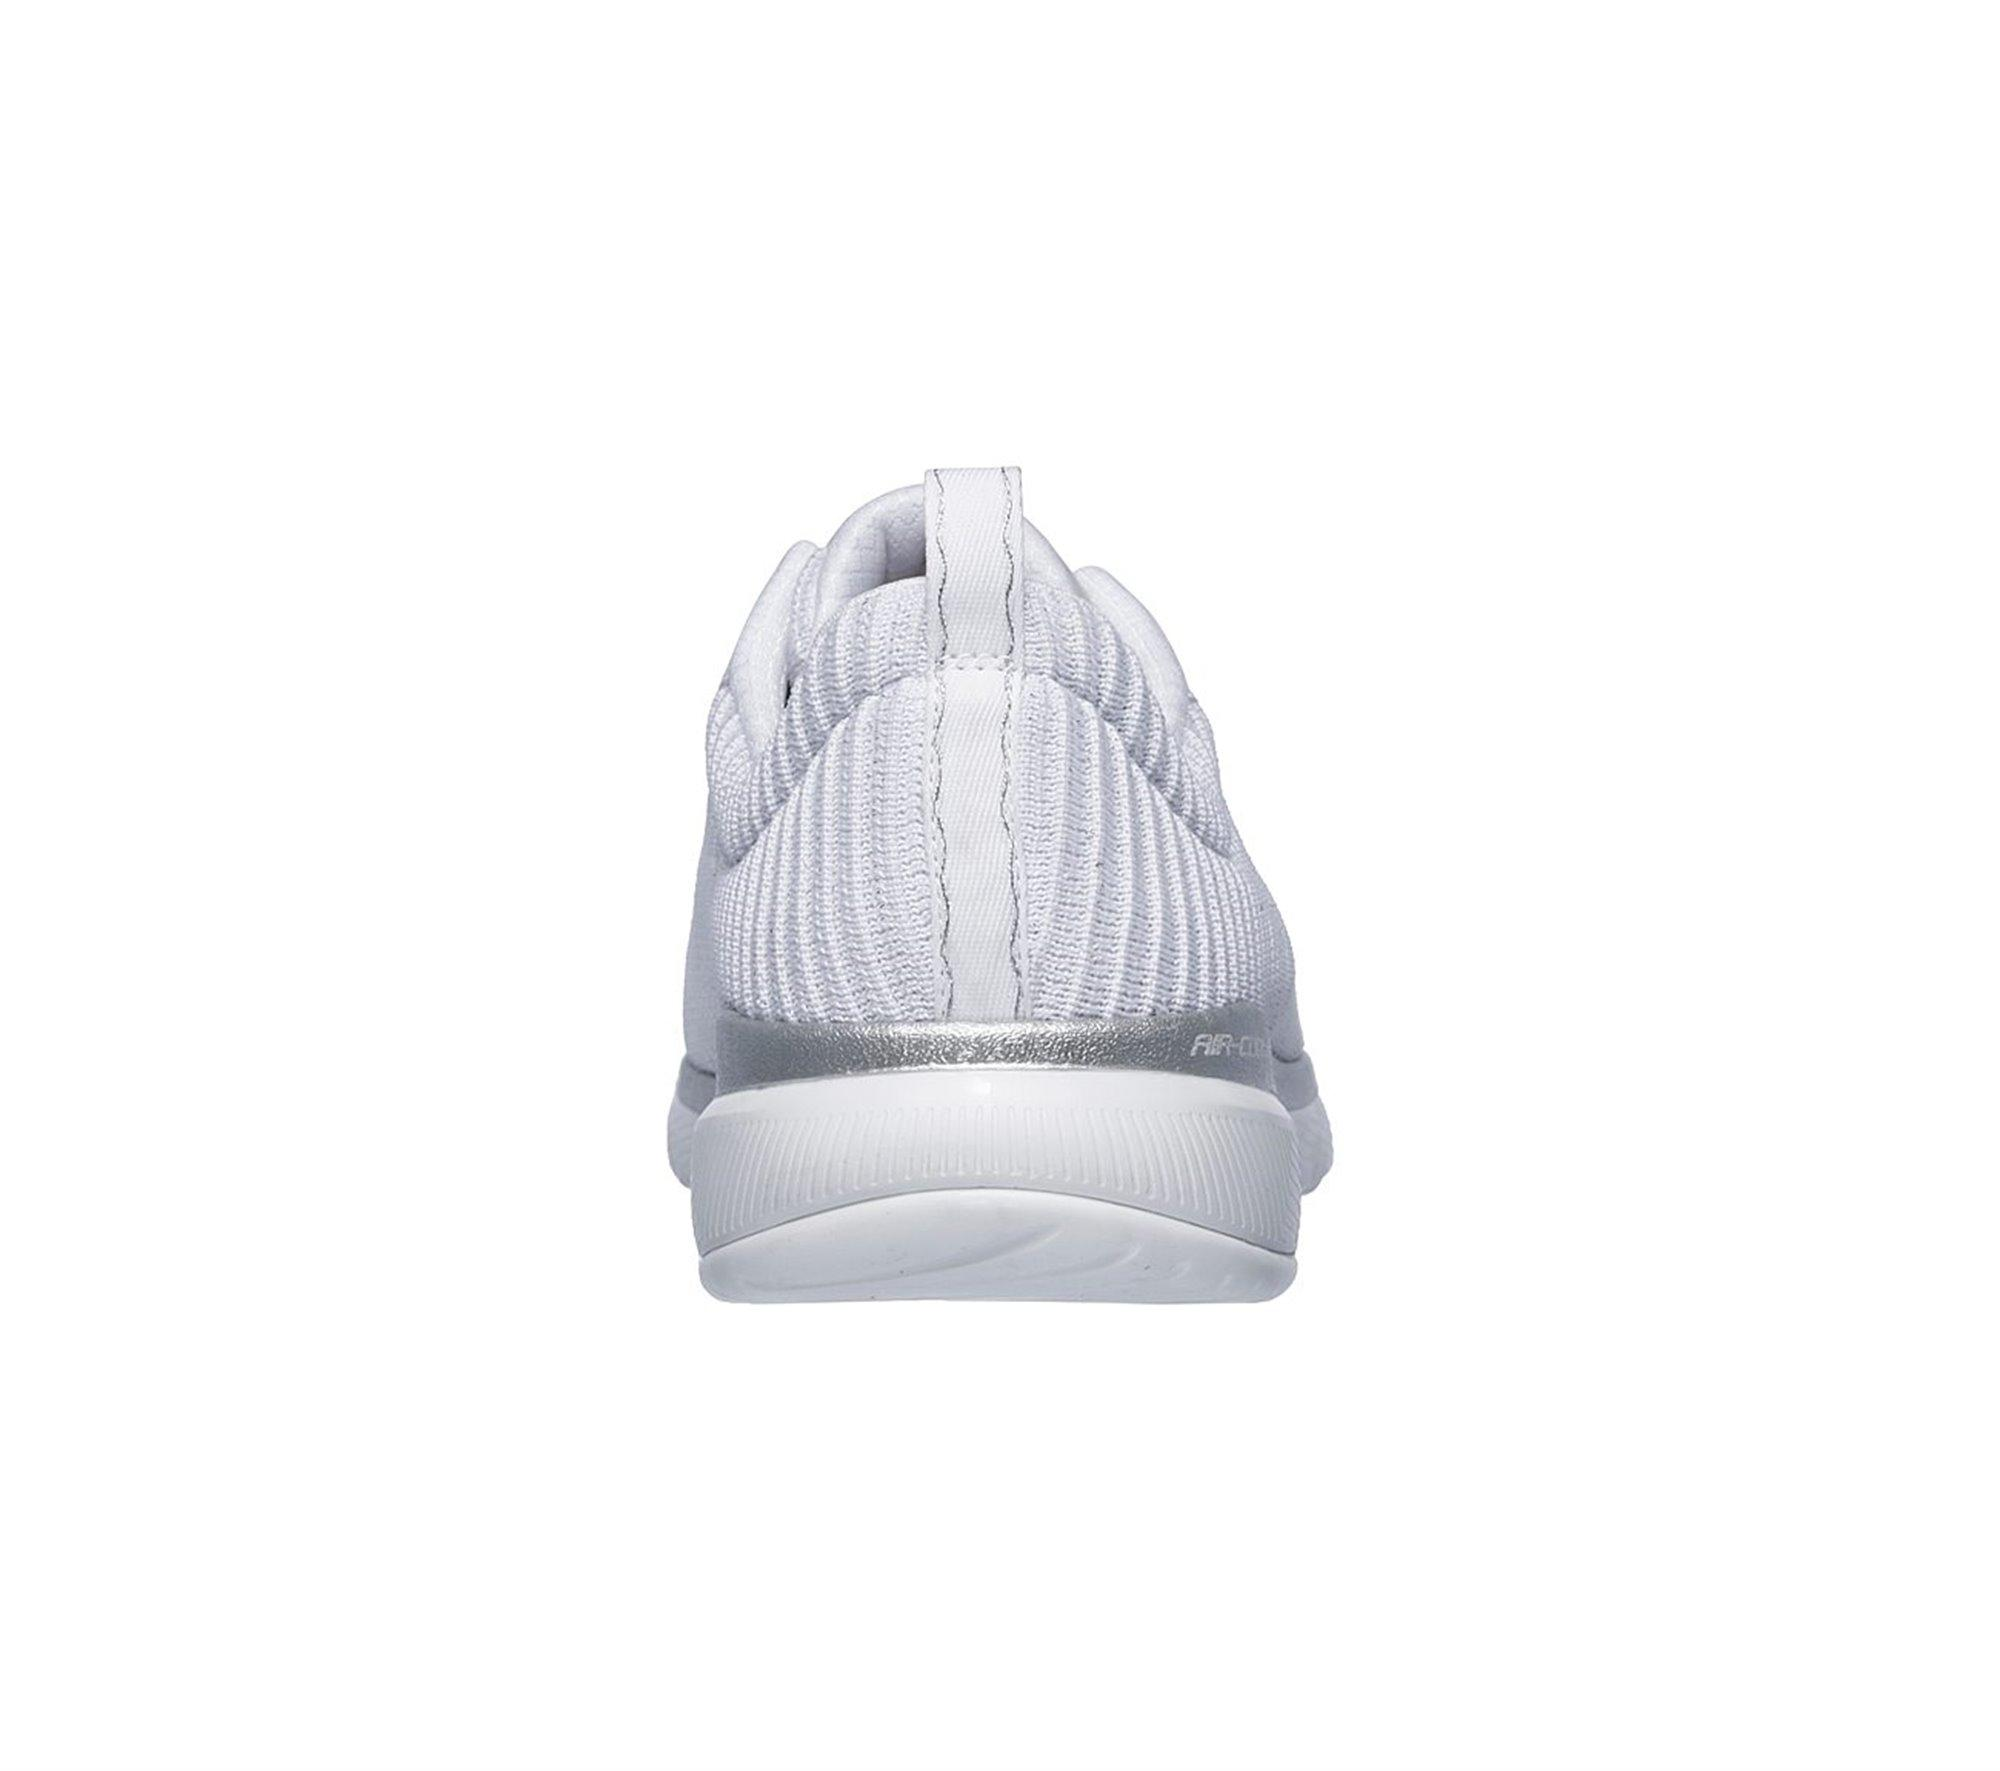 Resplandor Derecho Pigmalión  Skechers Synthetic Flex Appeal 3.0 Endless Glamour Sneaker in White/Silver  (White) - Lyst